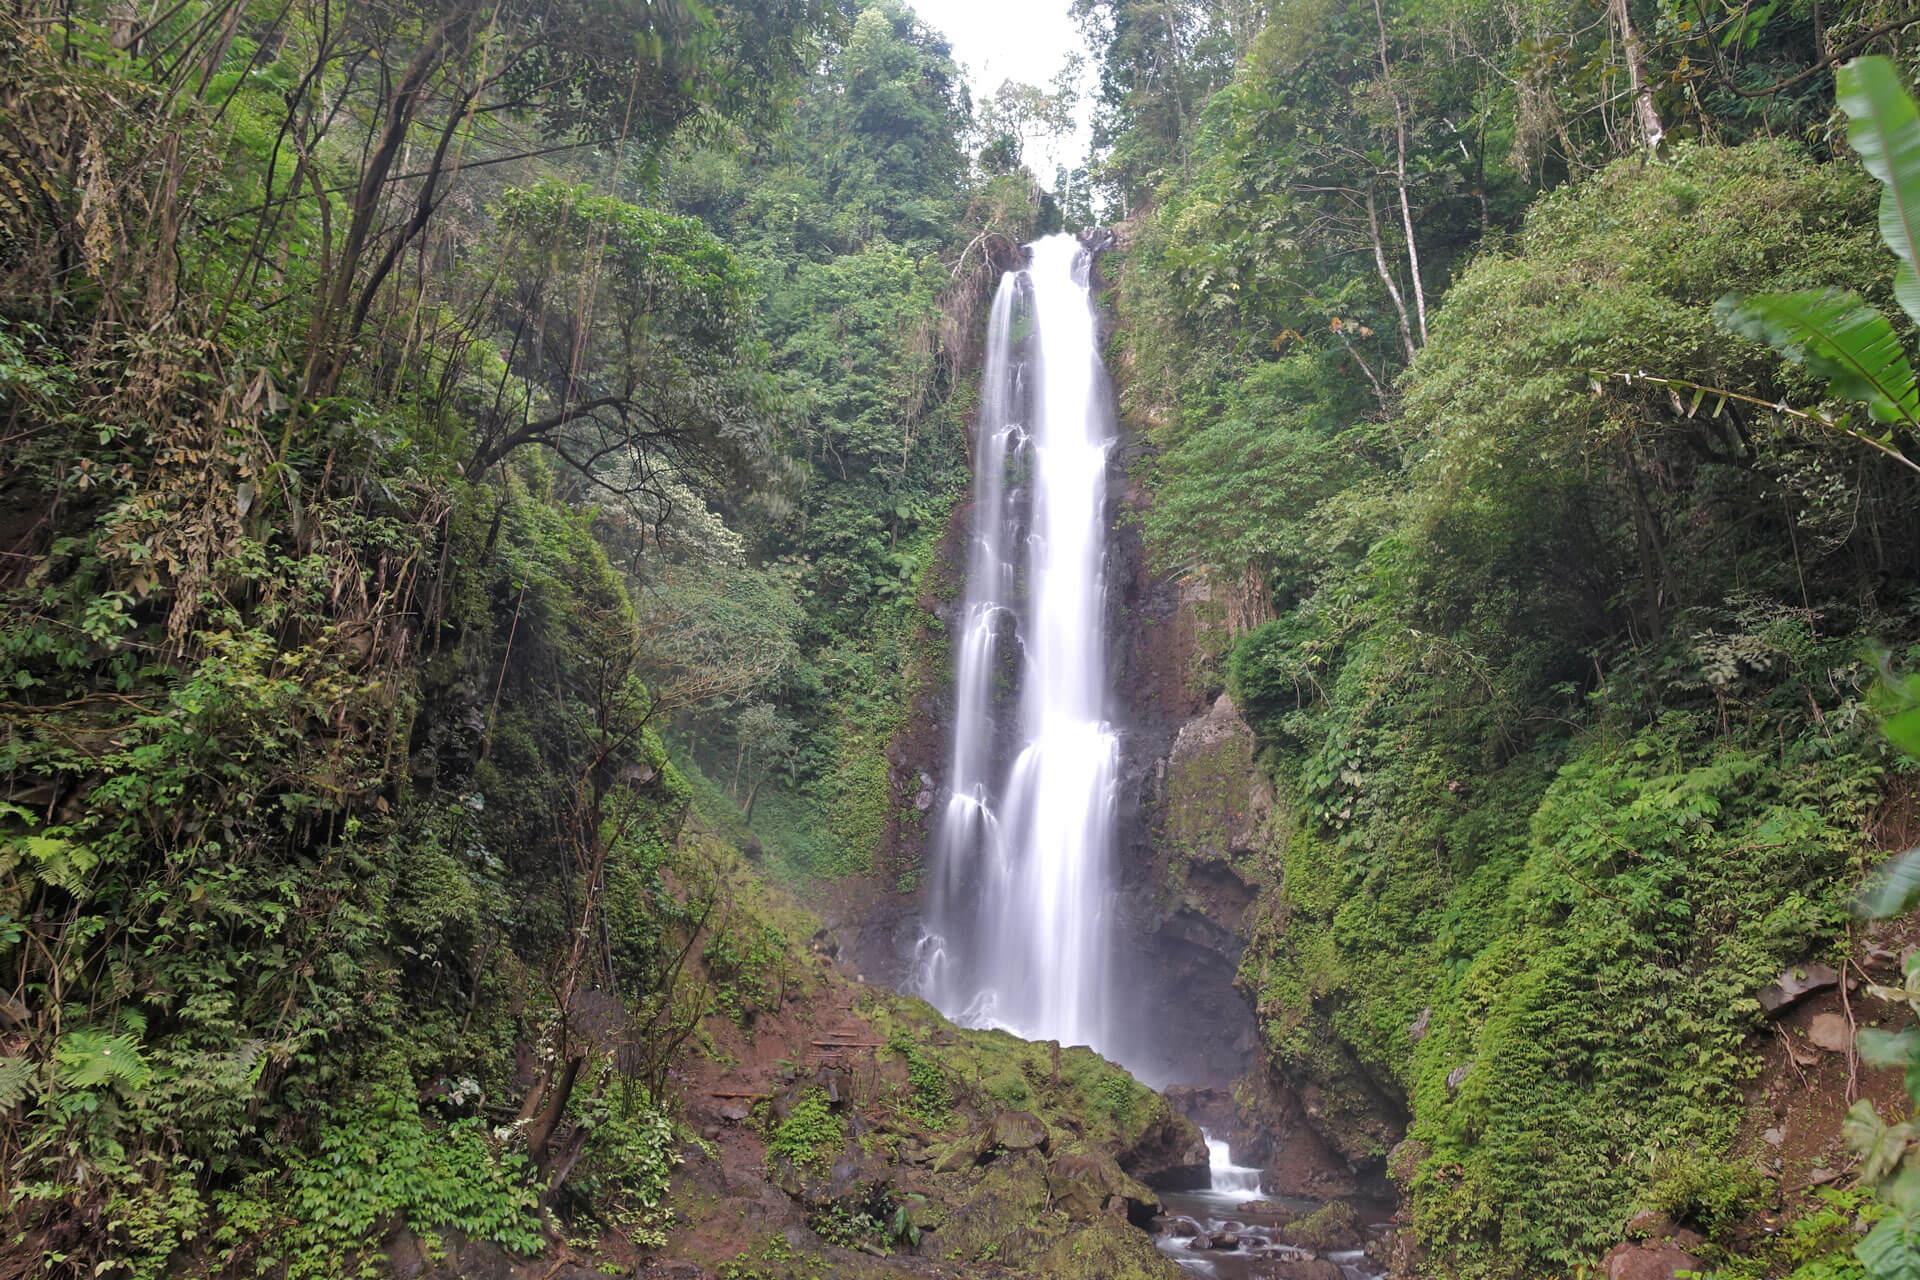 Melanting Wasserfall auf Bali